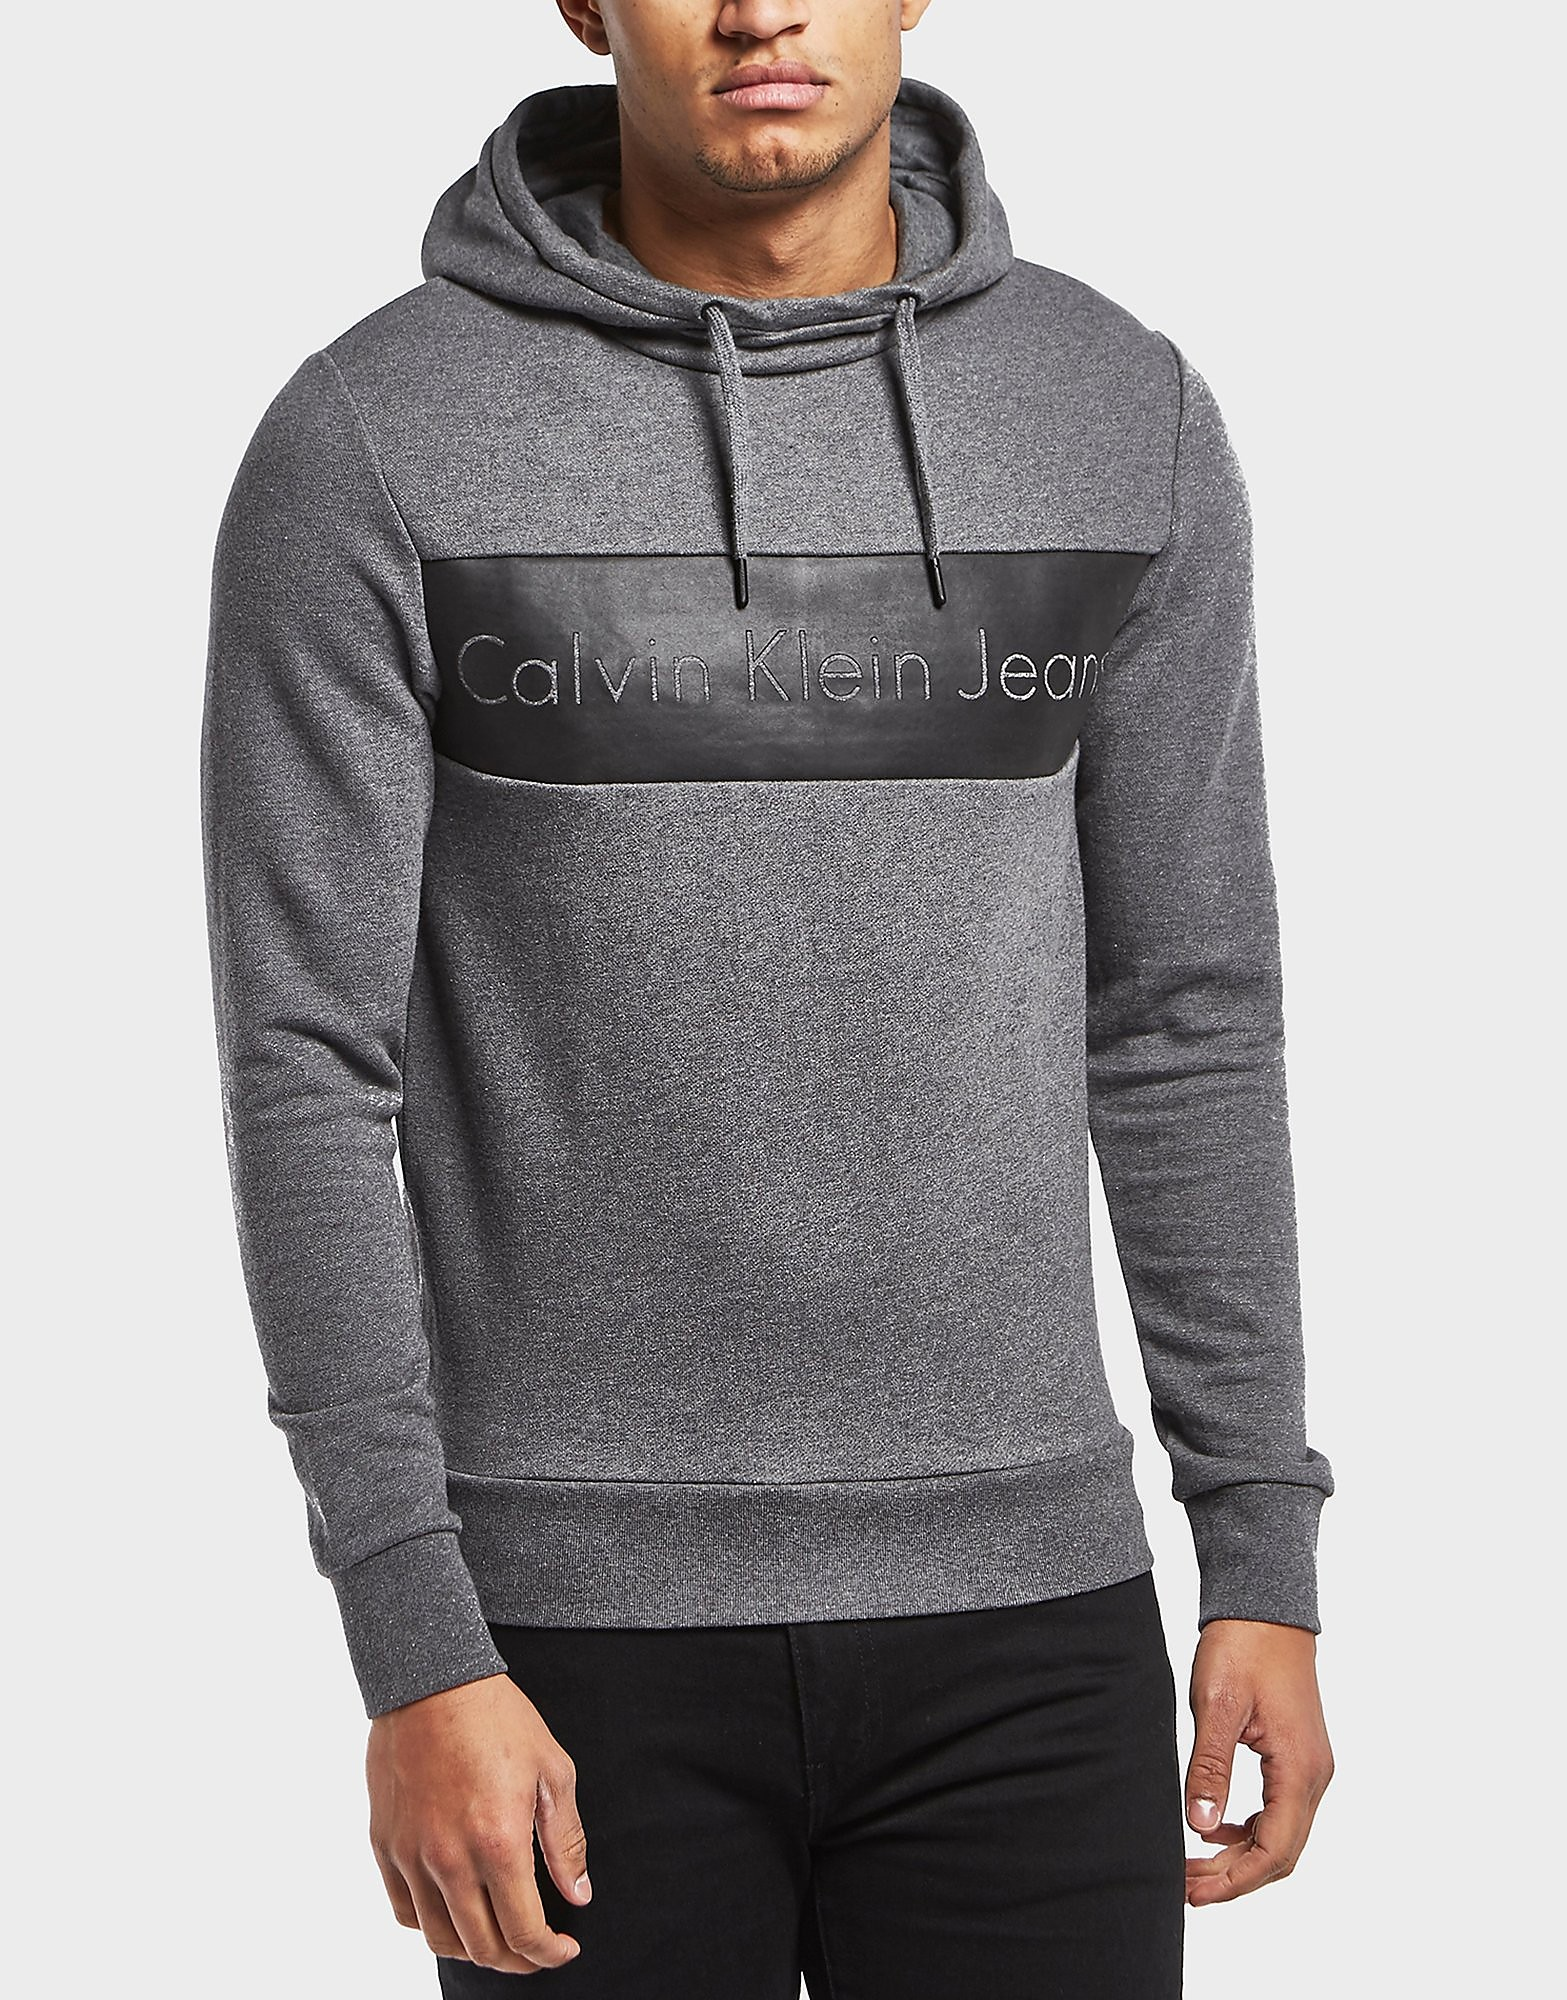 Calvin Klein Husion Overhead Hoody